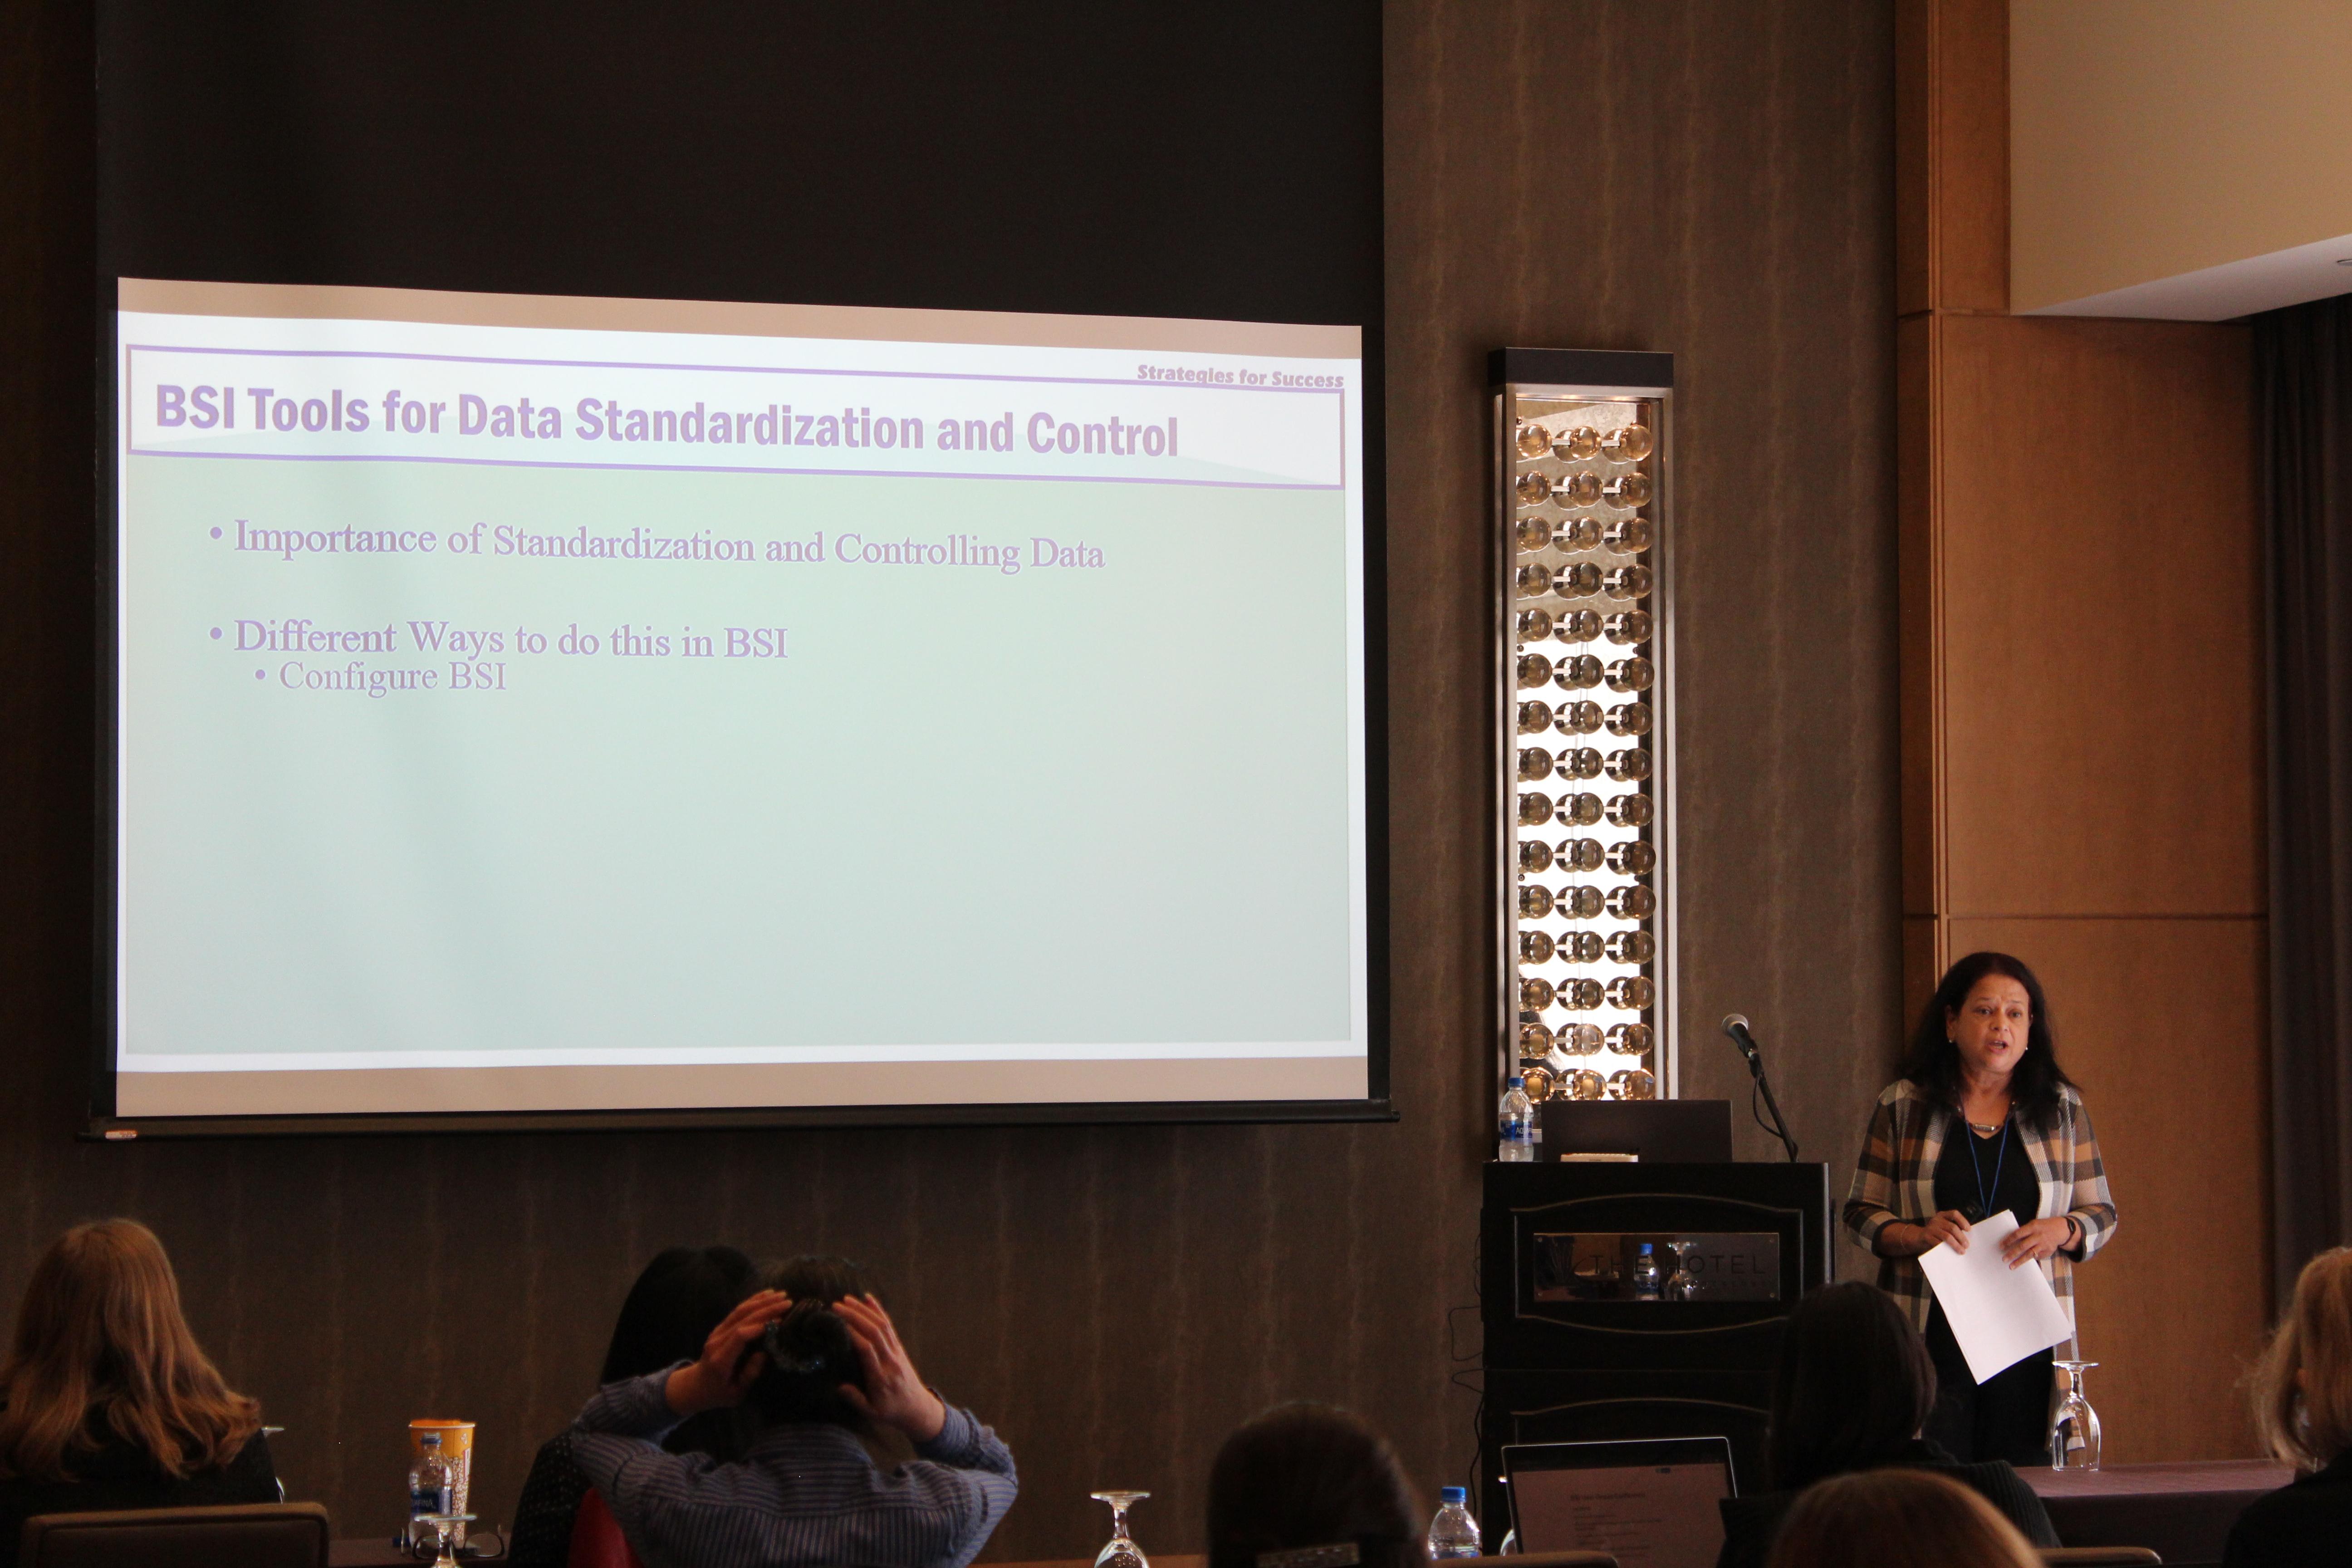 Data Standardization and Control presentation